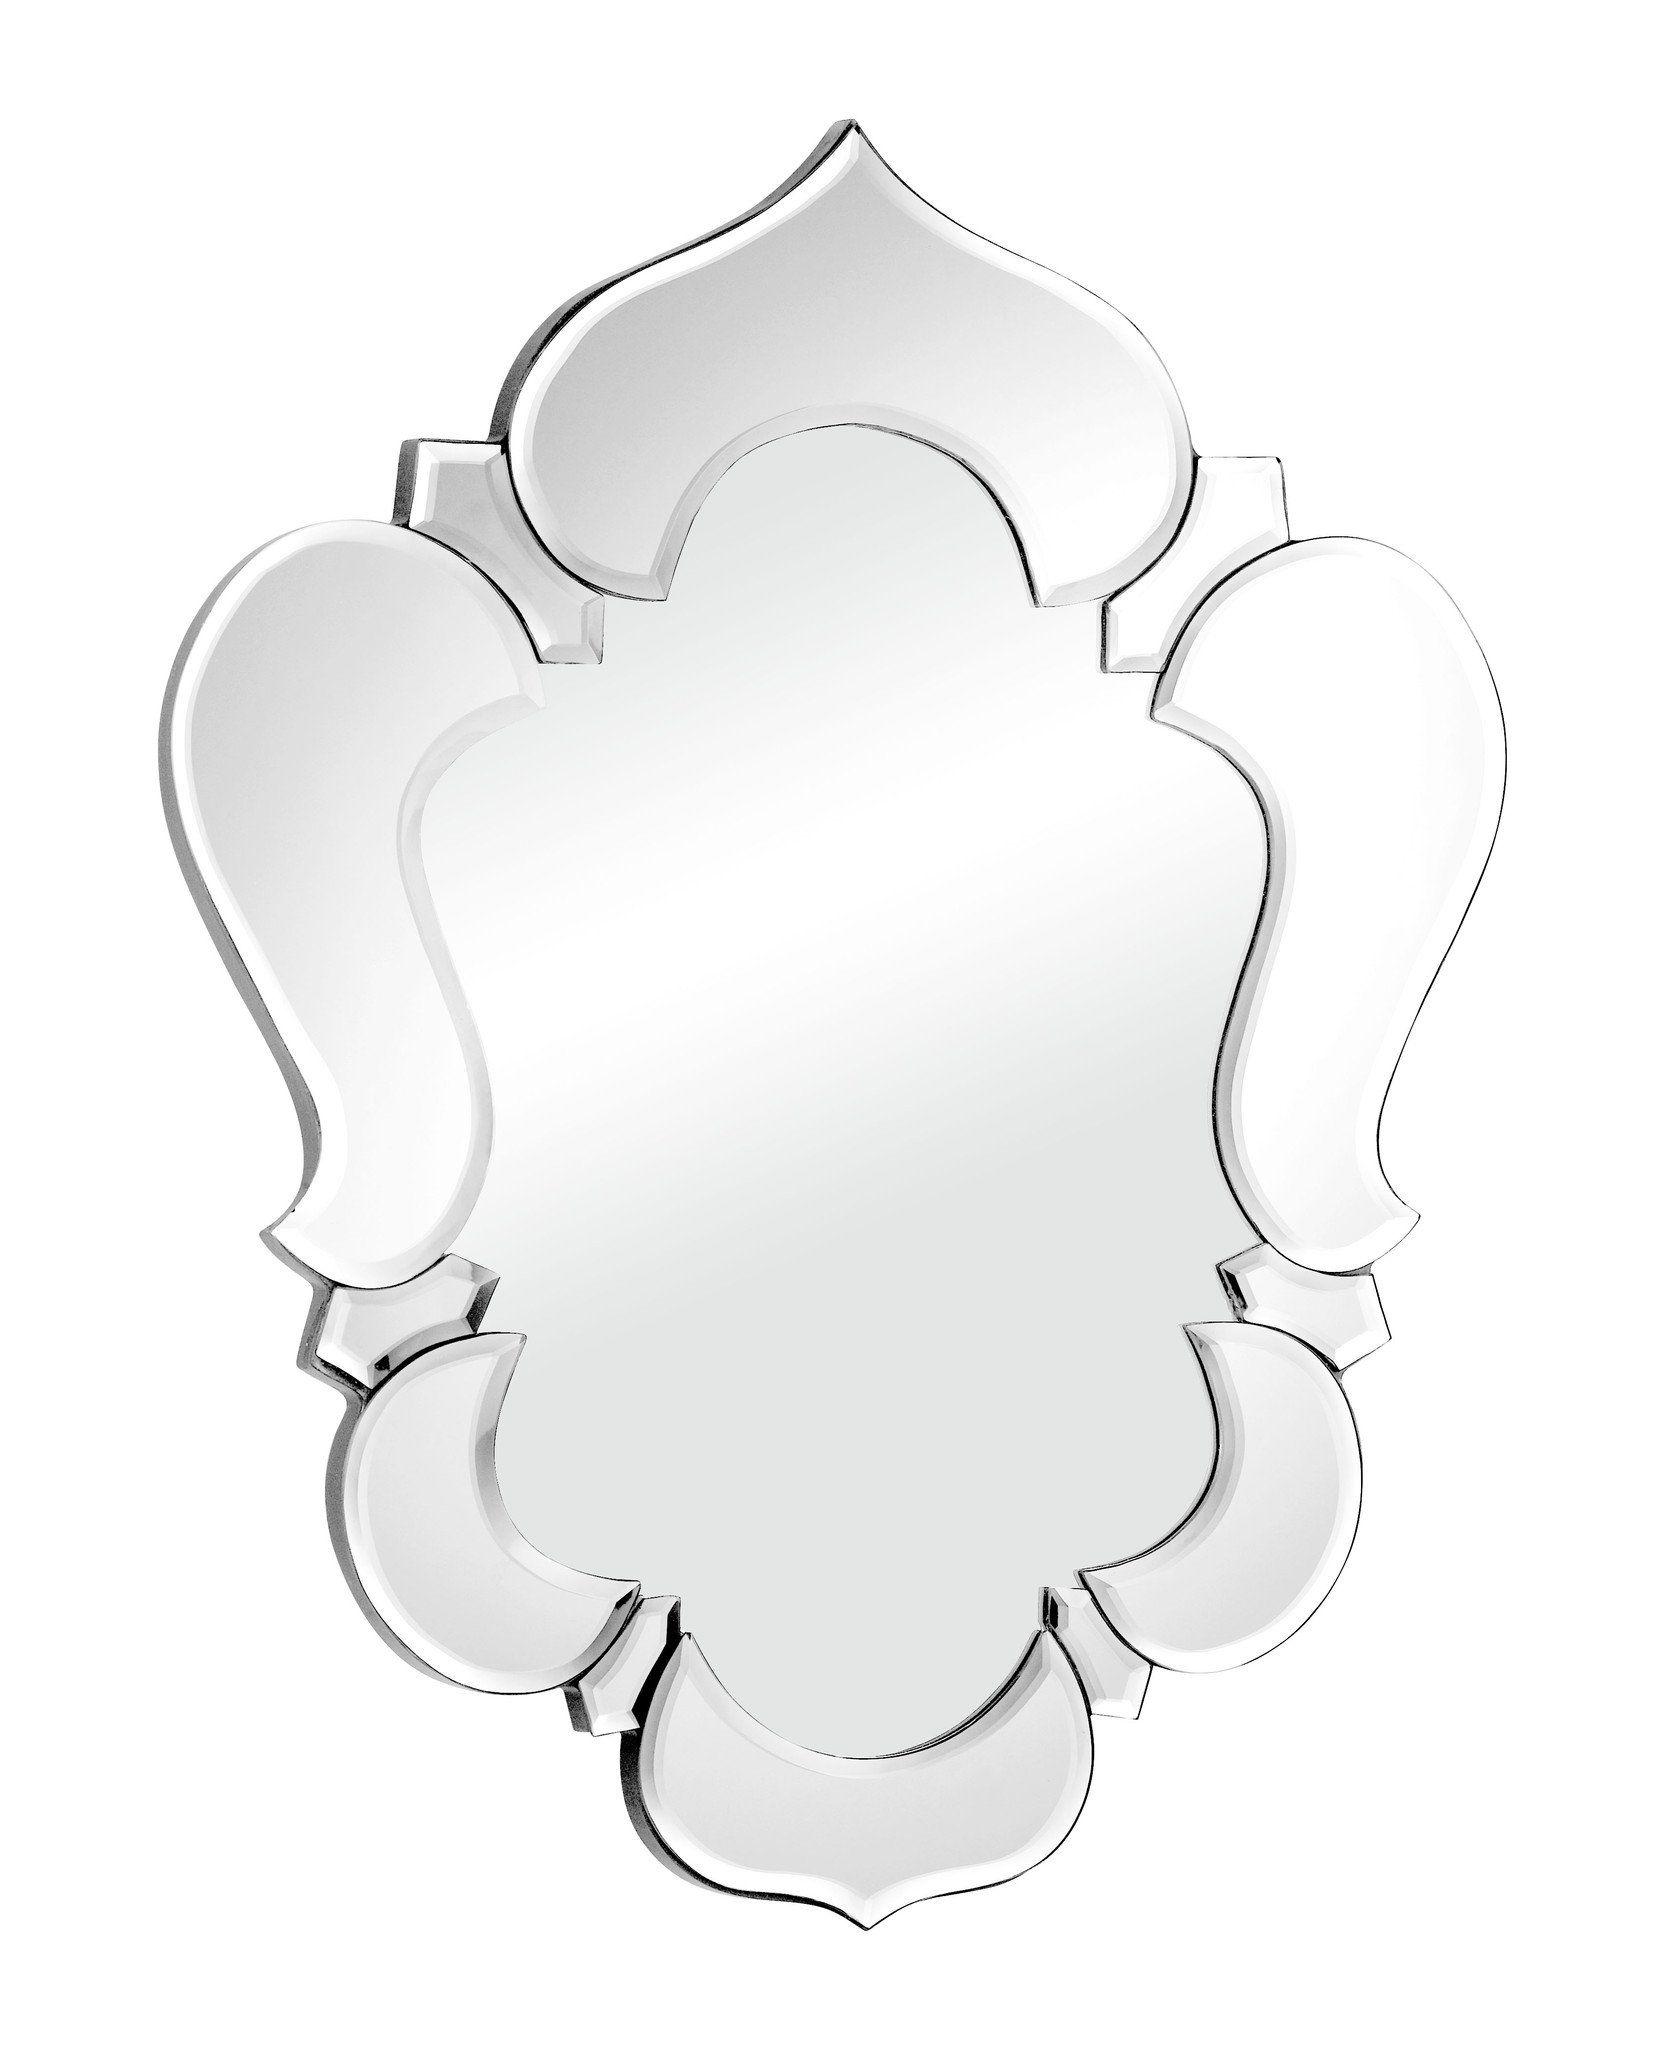 Vishnu Mirror Clear Edge Contemporary Mirror Specialty Mirrors